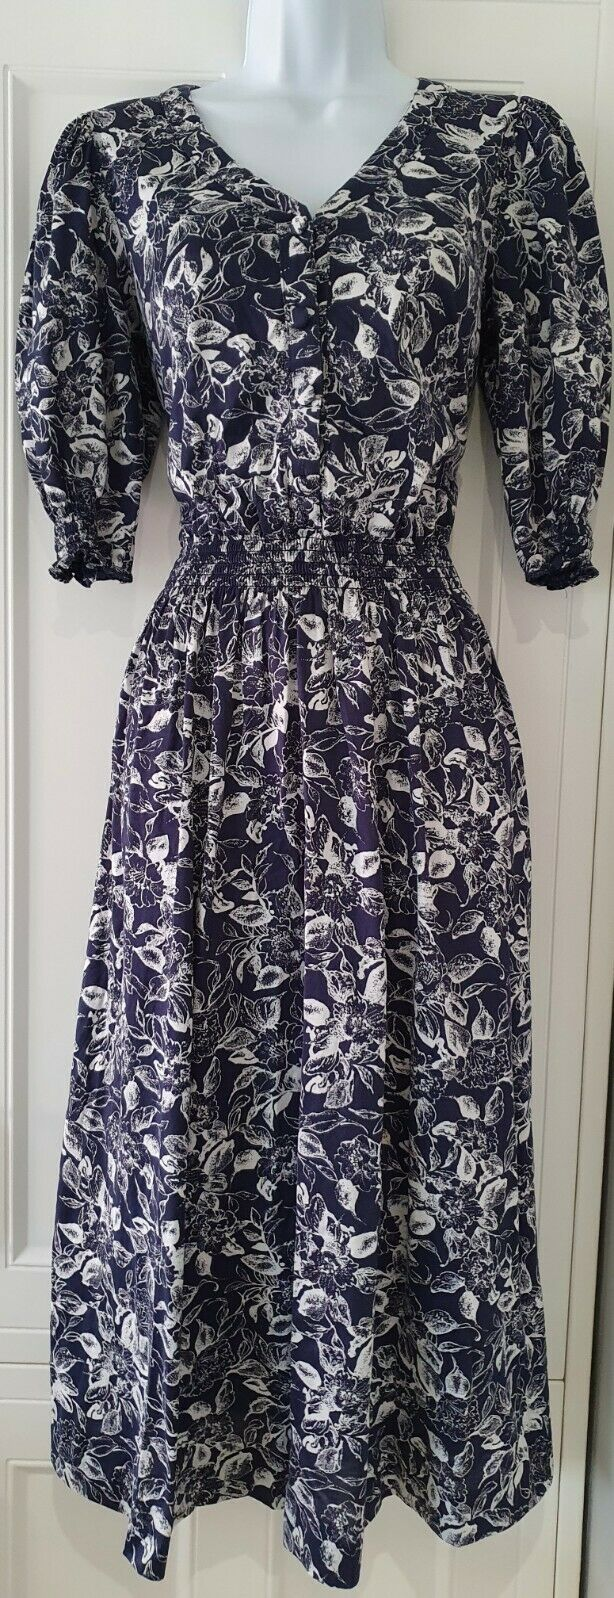 Womens Vintage Laura Ashley Blue White Floral Puff Sleeve Midi Tea Dress 10.